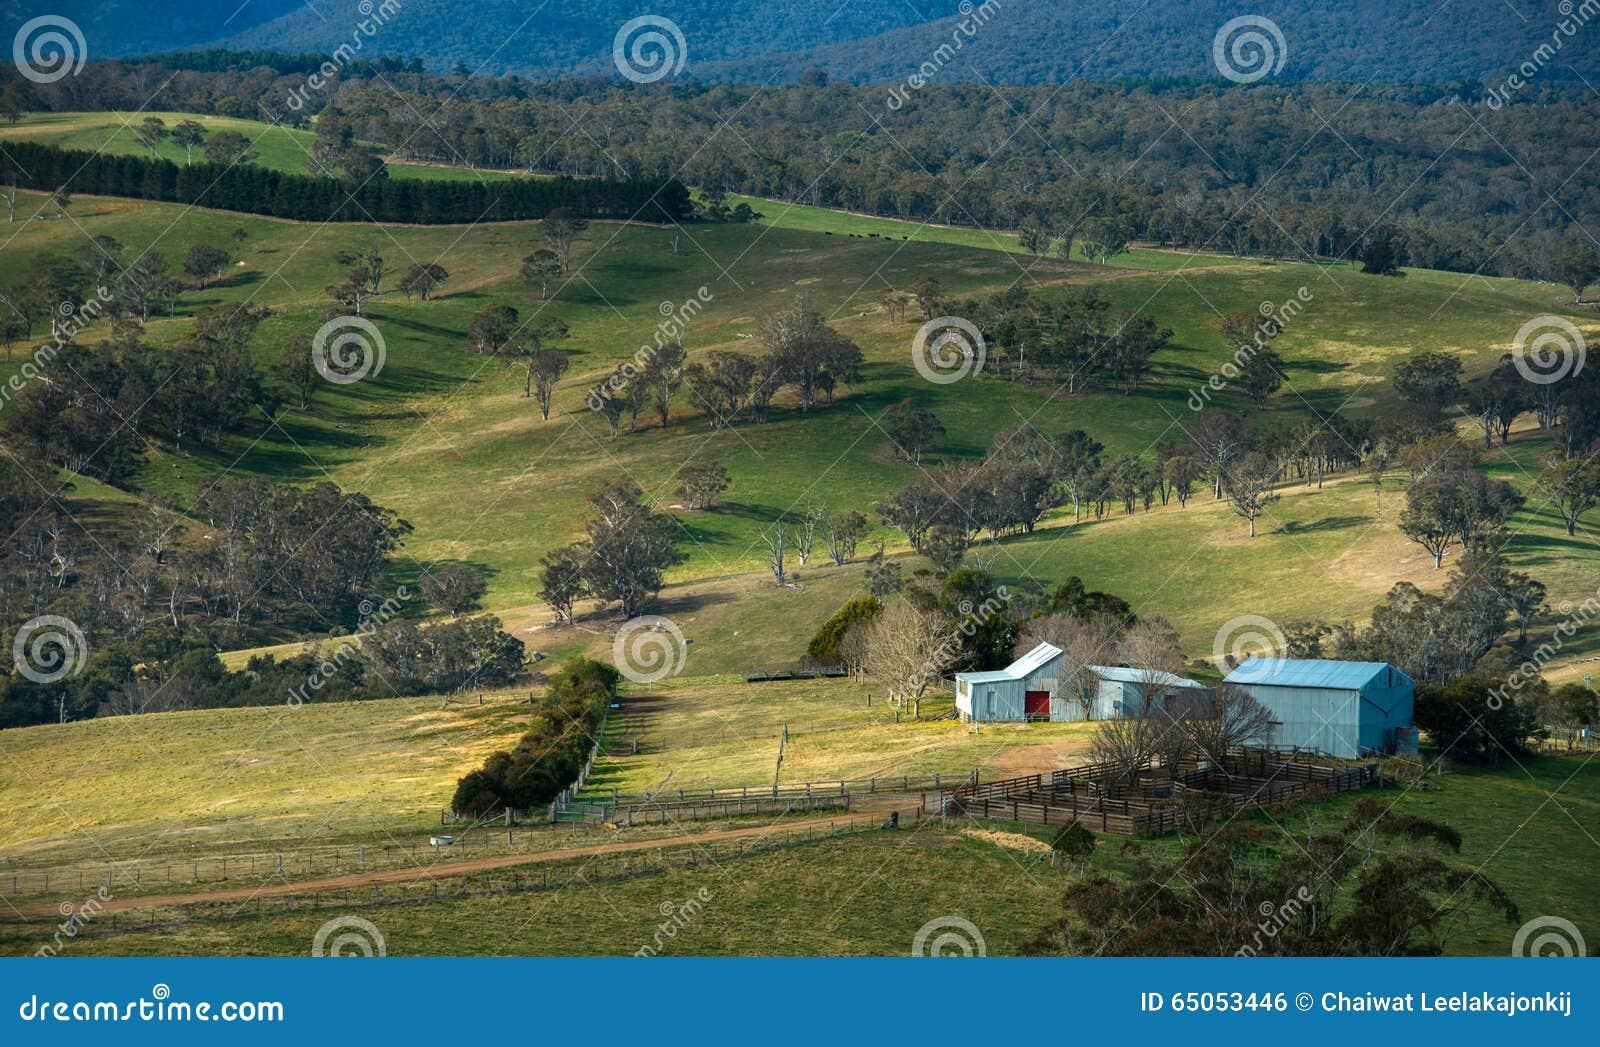 Oberon australia